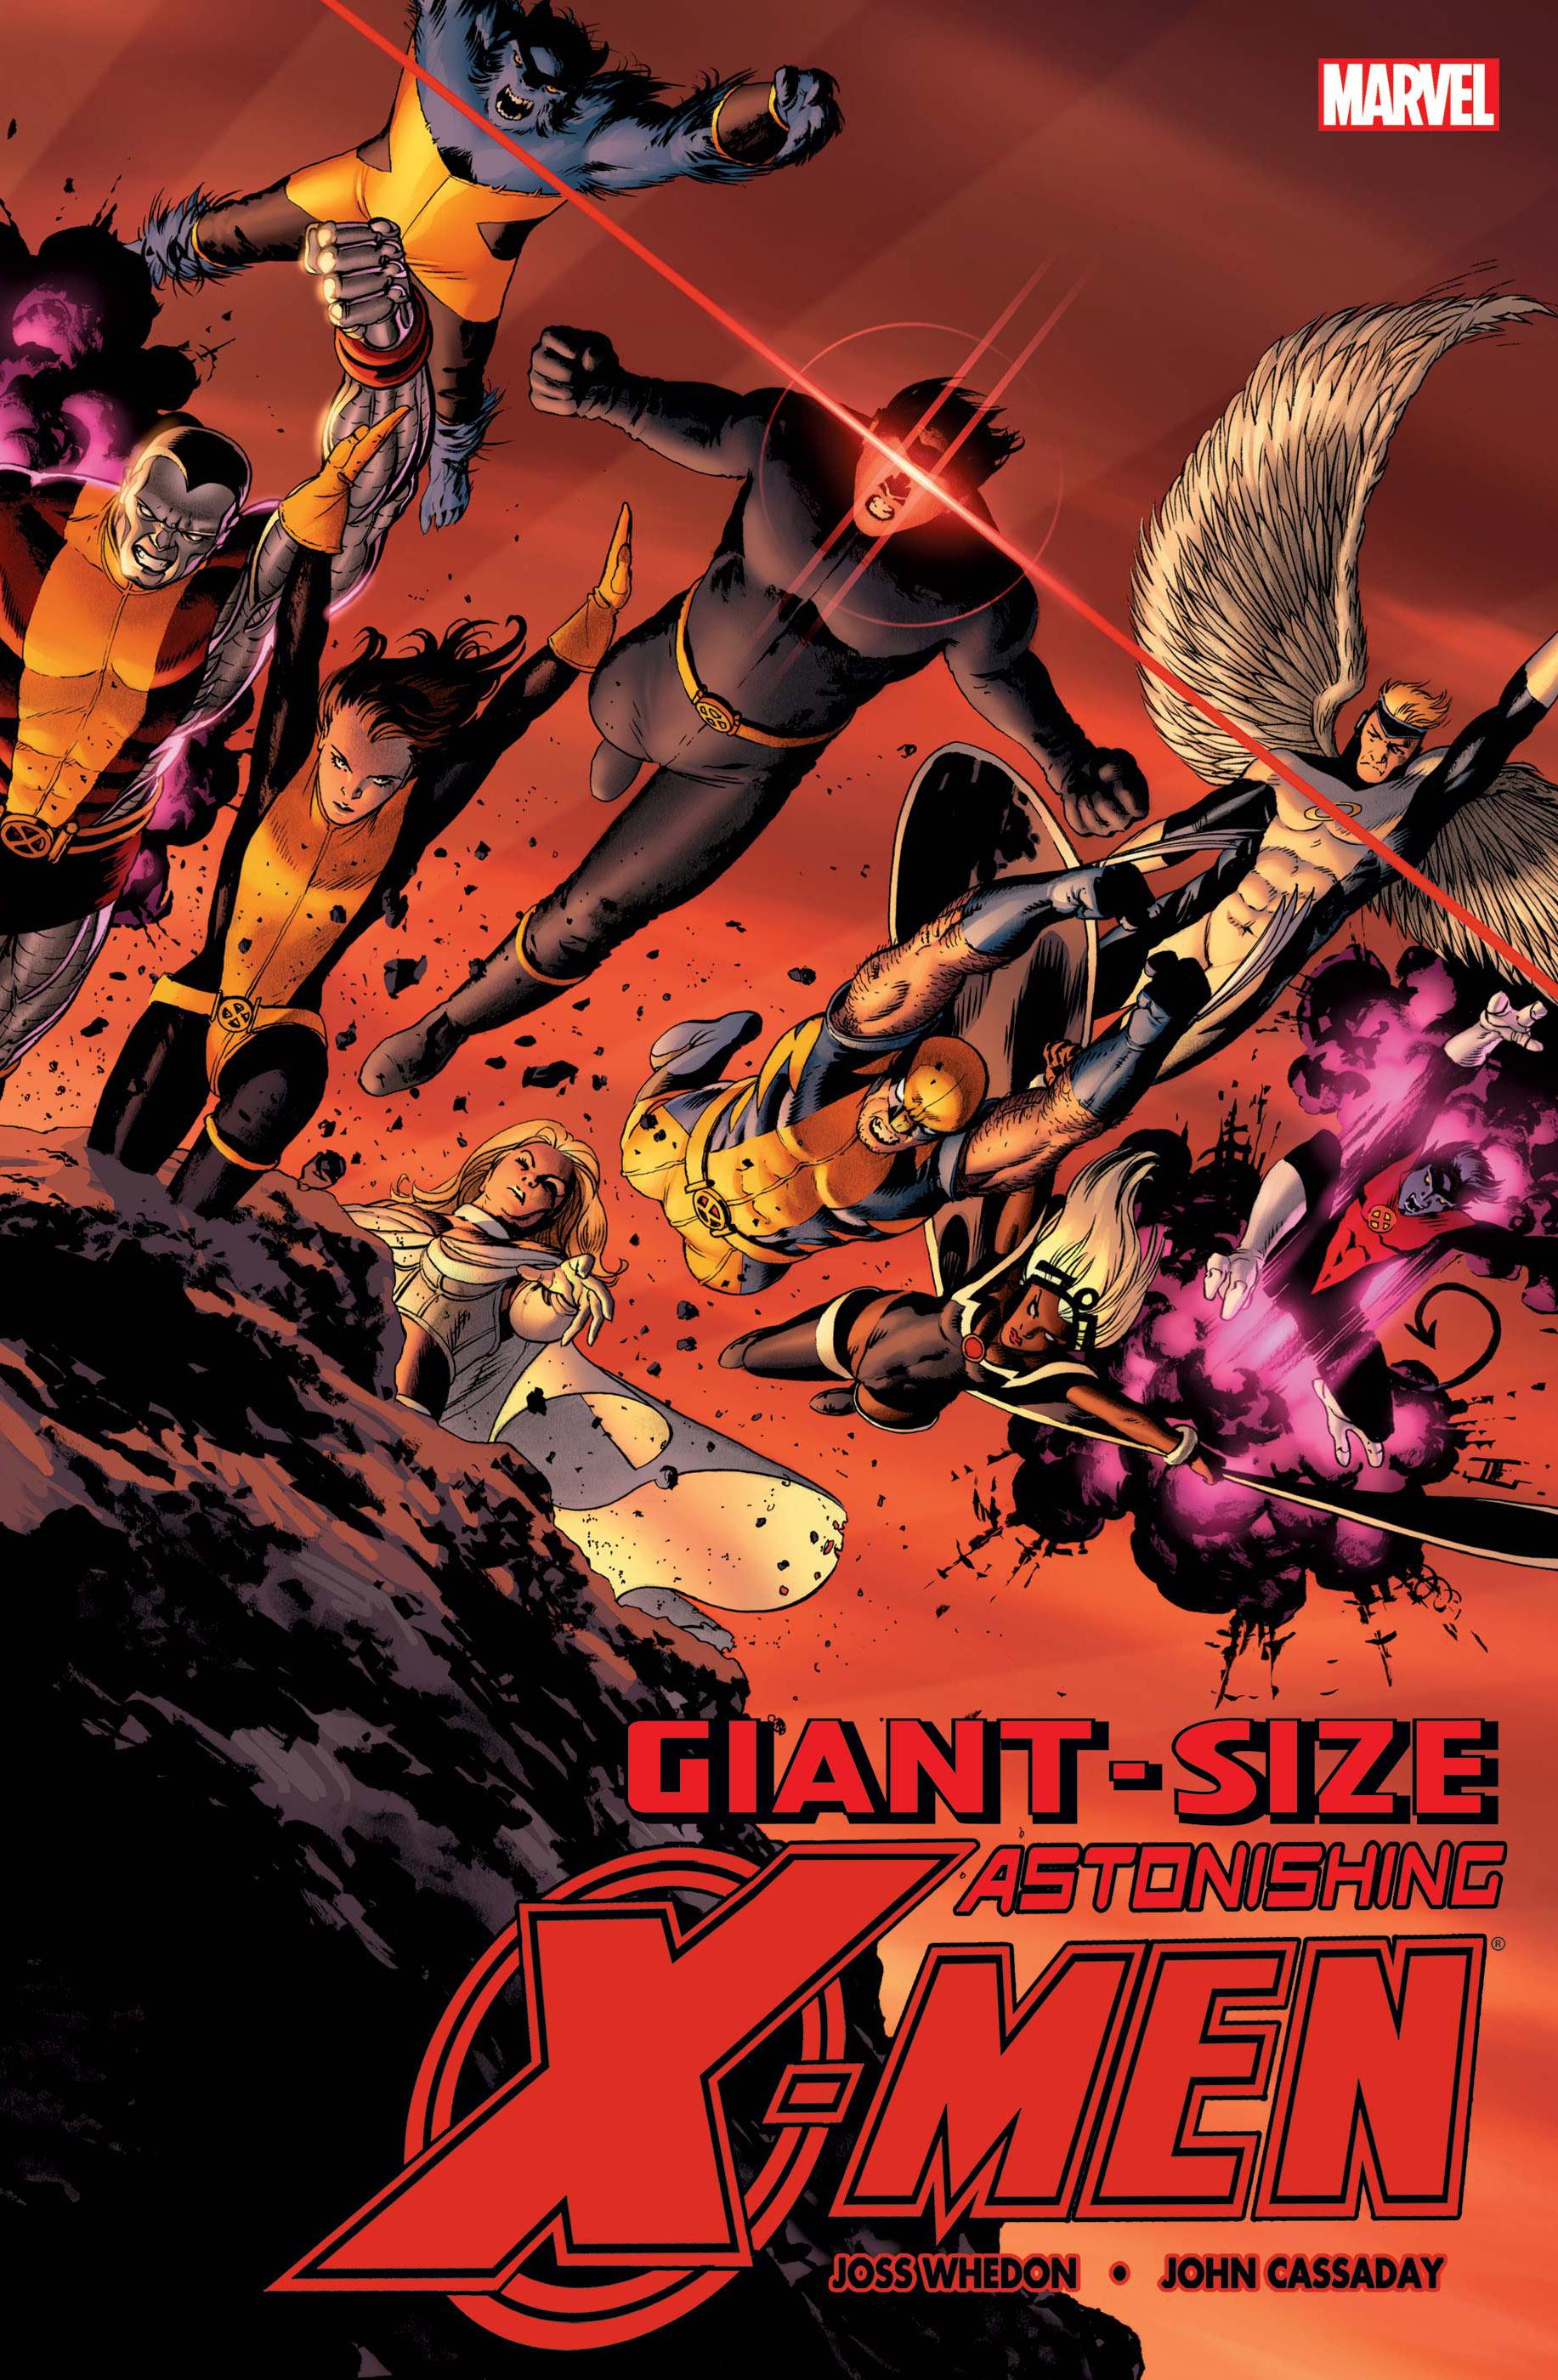 Giant-Size Astonishing X-Men (2008) #1